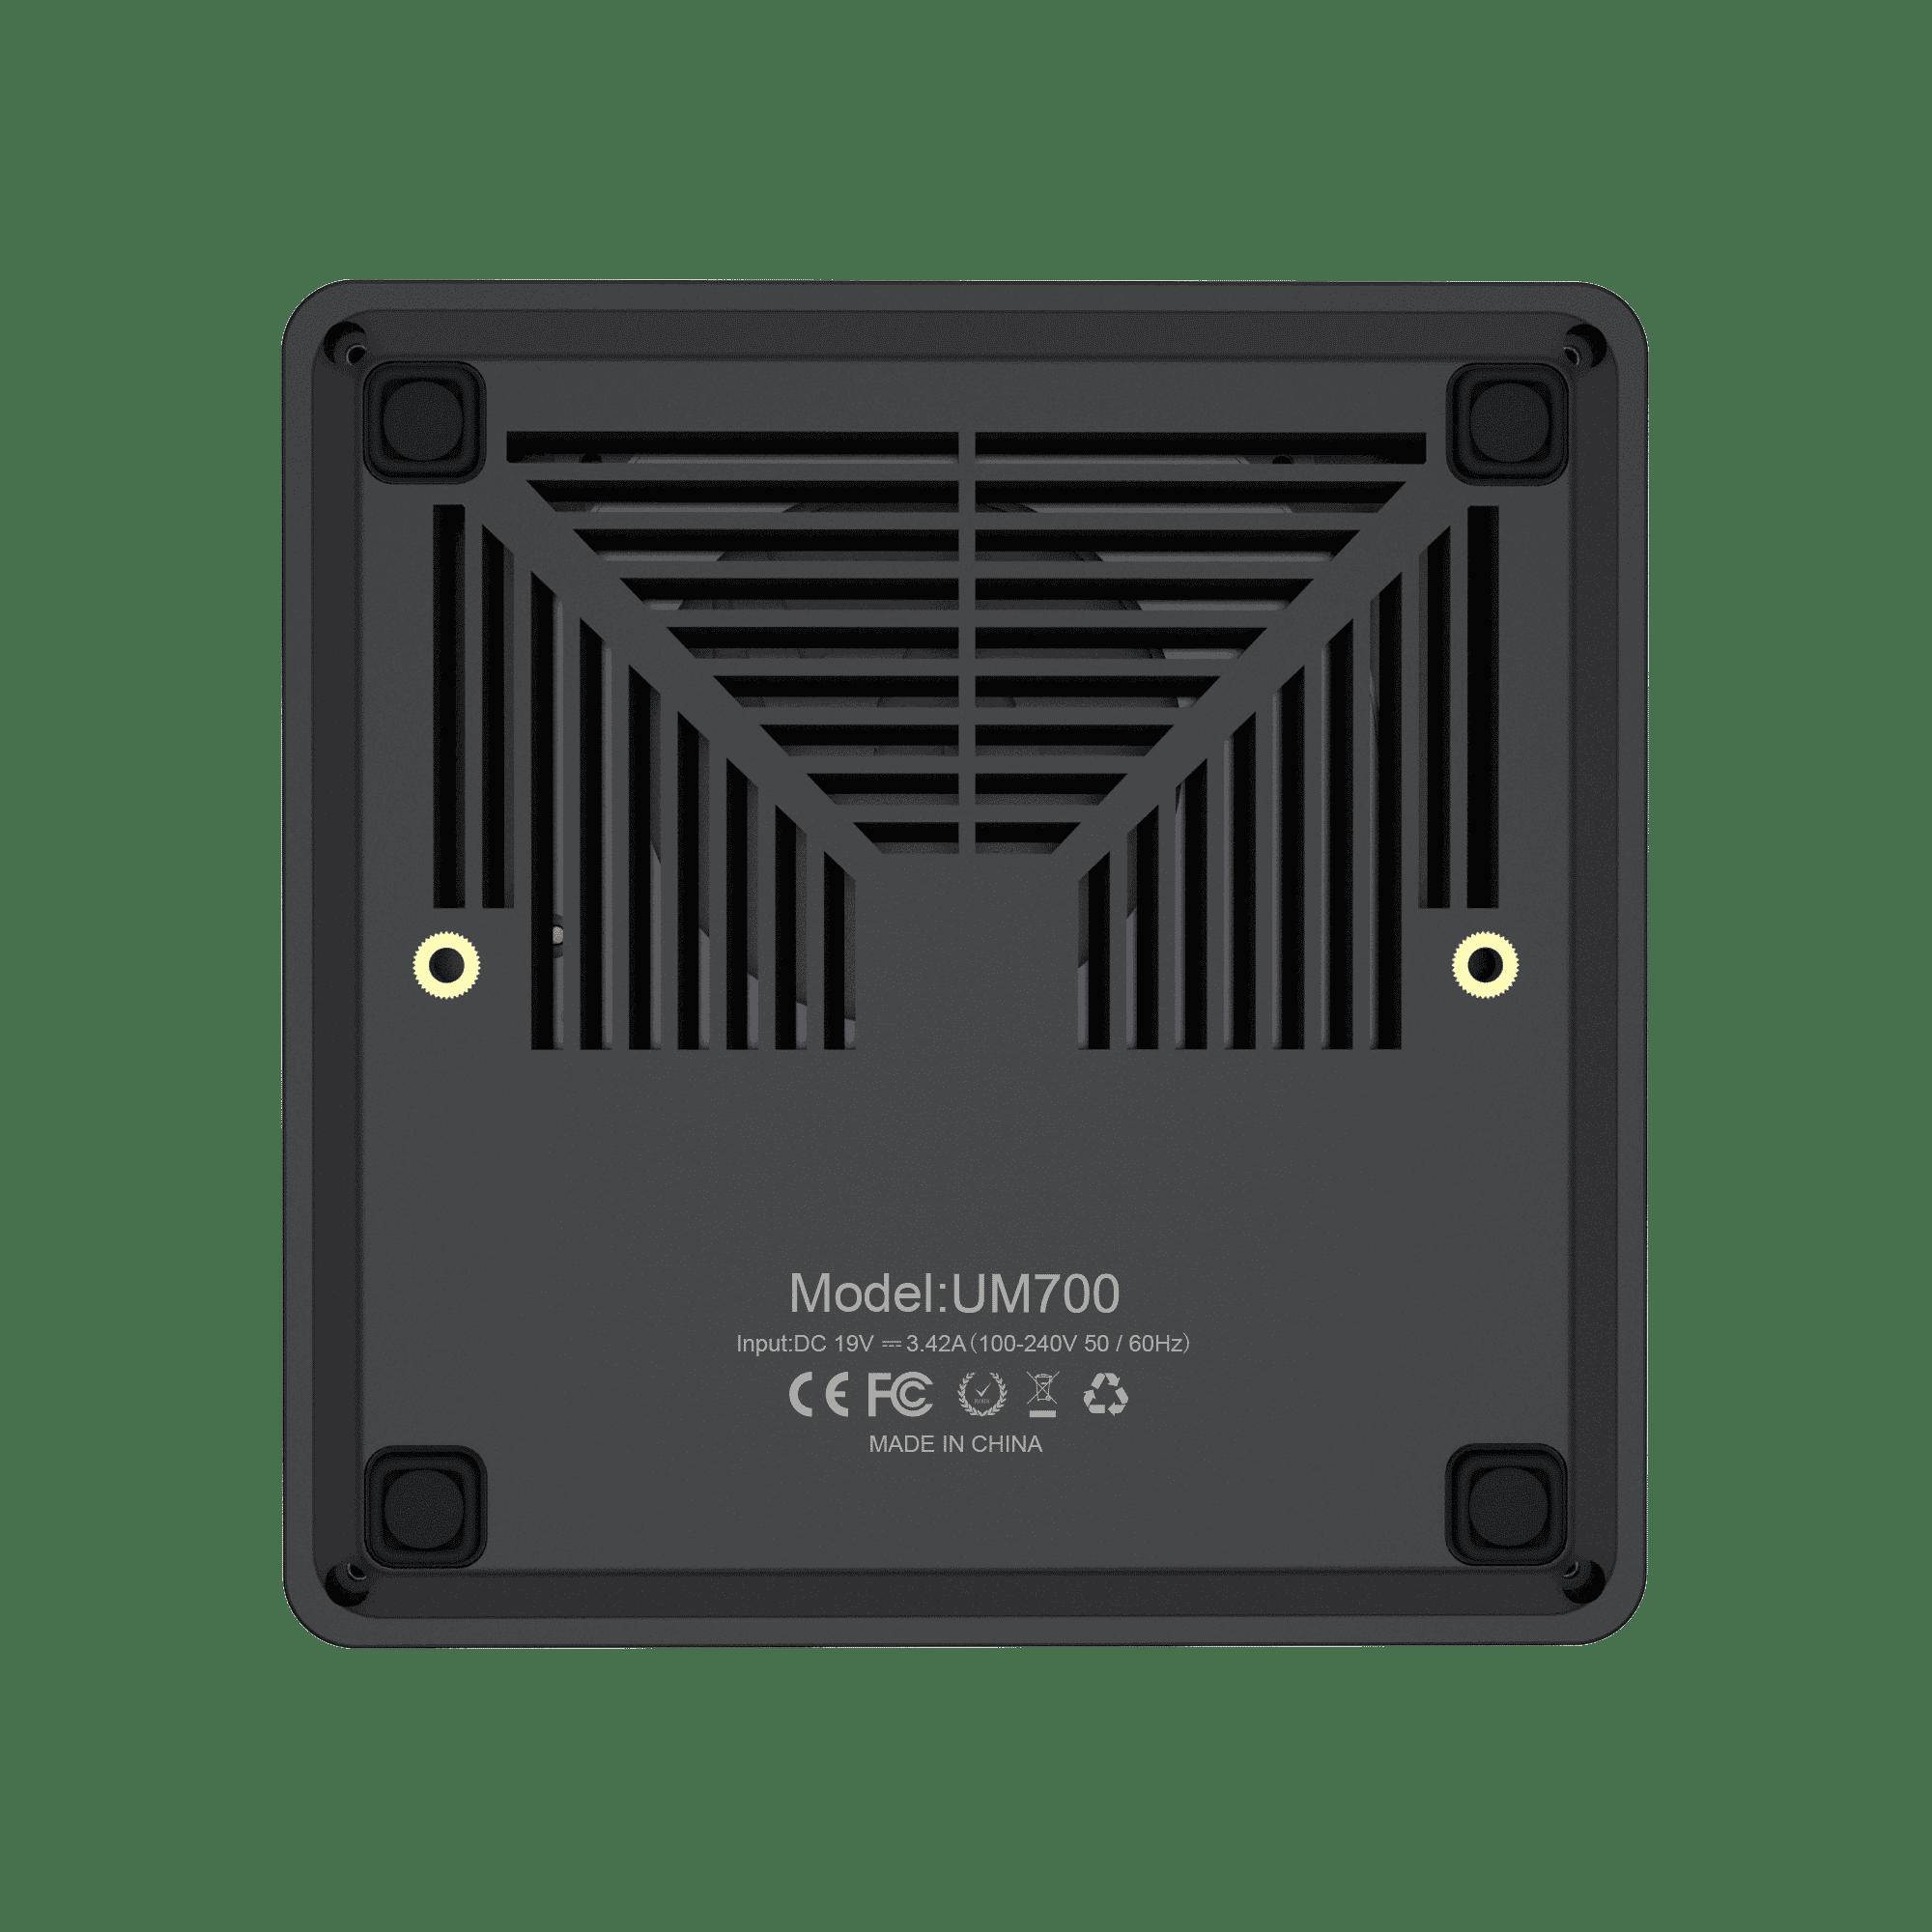 MinisForum EliteMini UM700 - Showing from bottom with vents